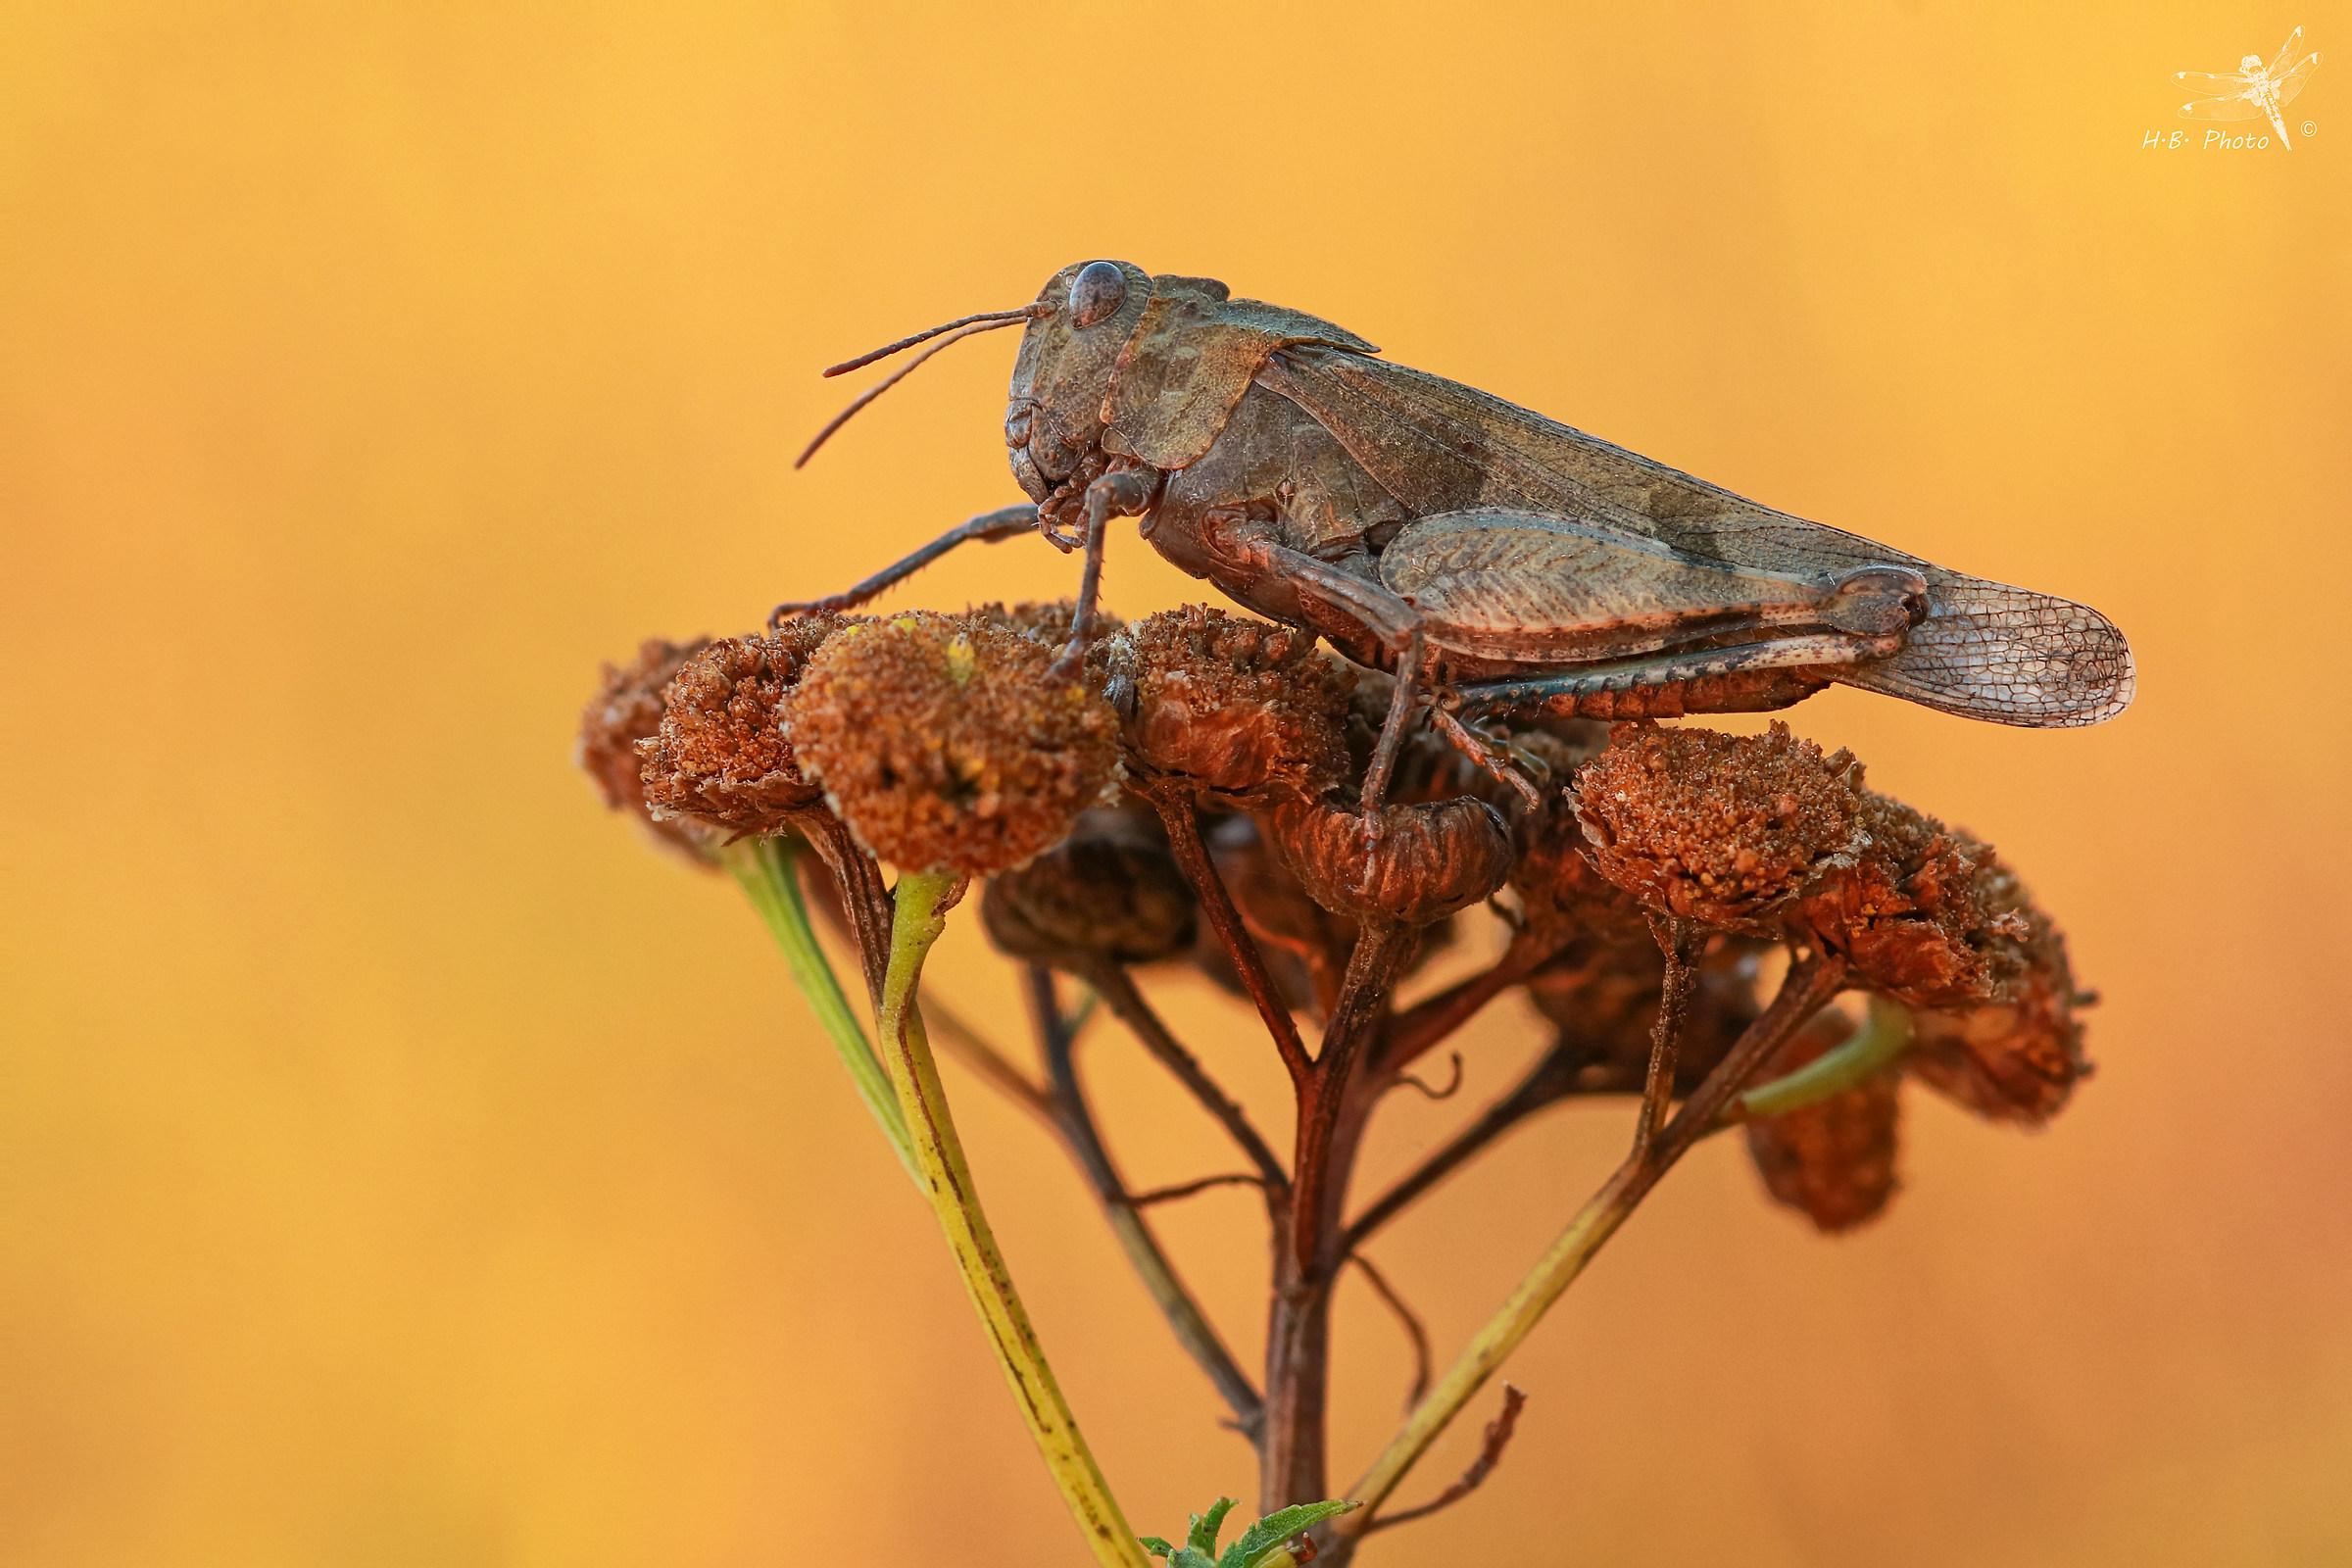 Oedipoda caerulescens...